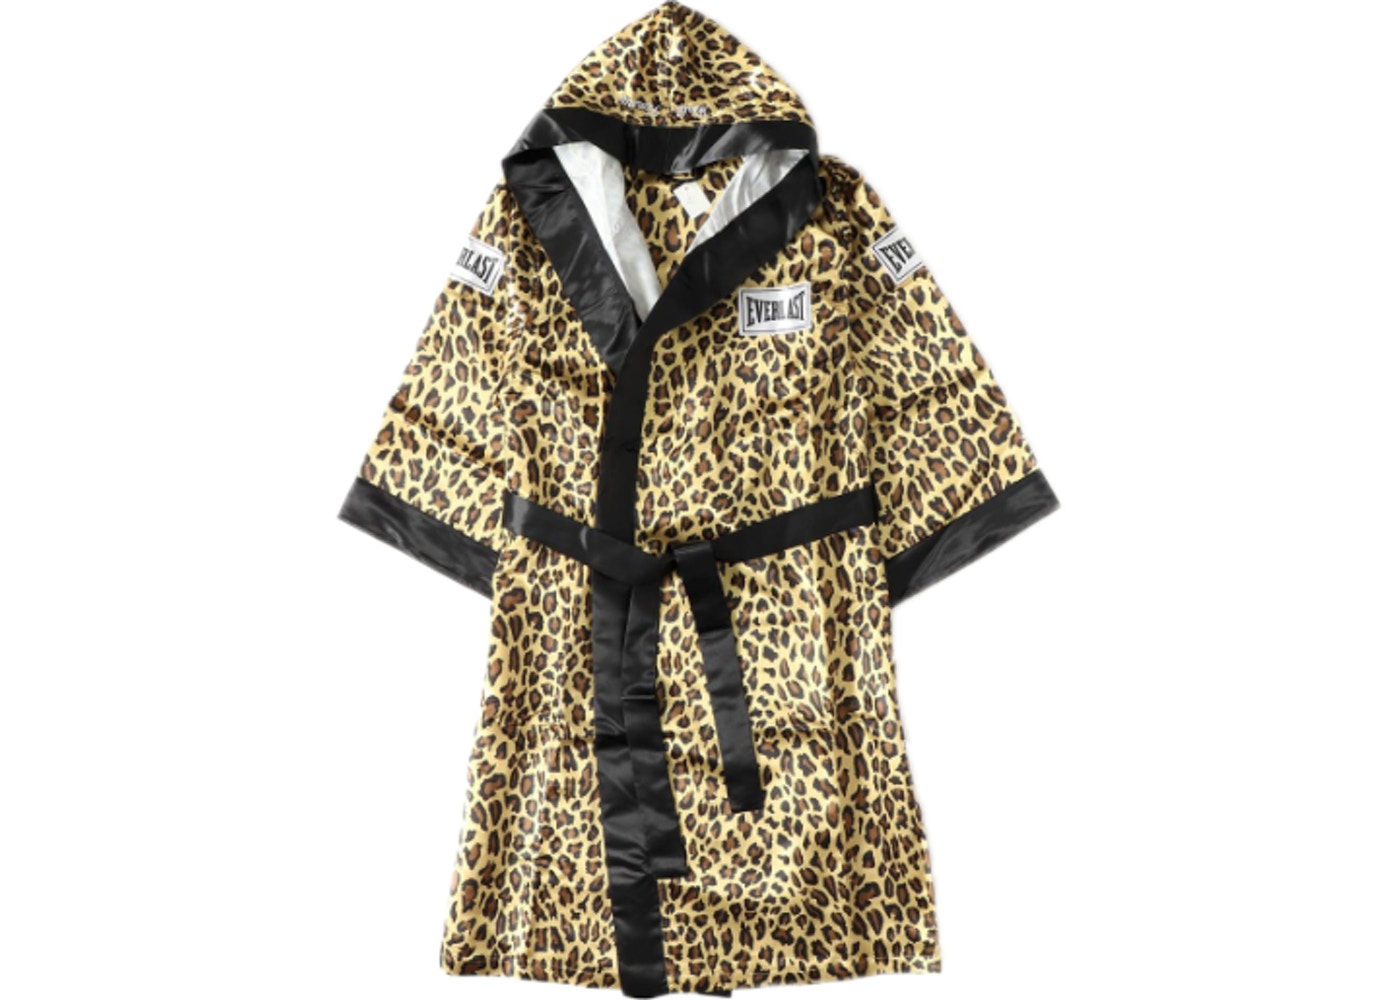 Supreme Everlast Satin Hooded Boxing Robe Leopard - FW17 53e518abc122